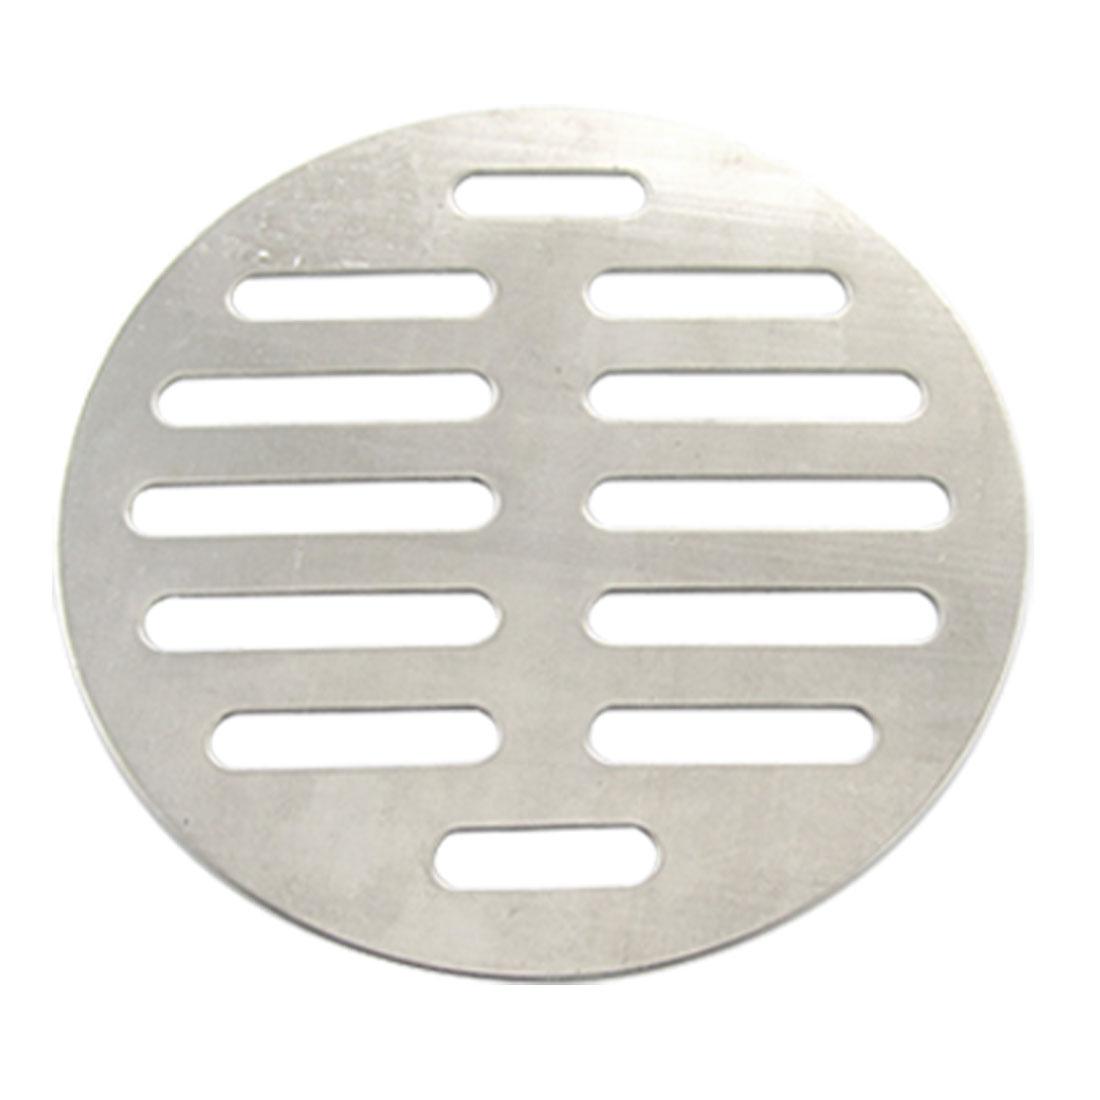 Bathroom Silver Tone Stainless Steel Floor Drain Cover